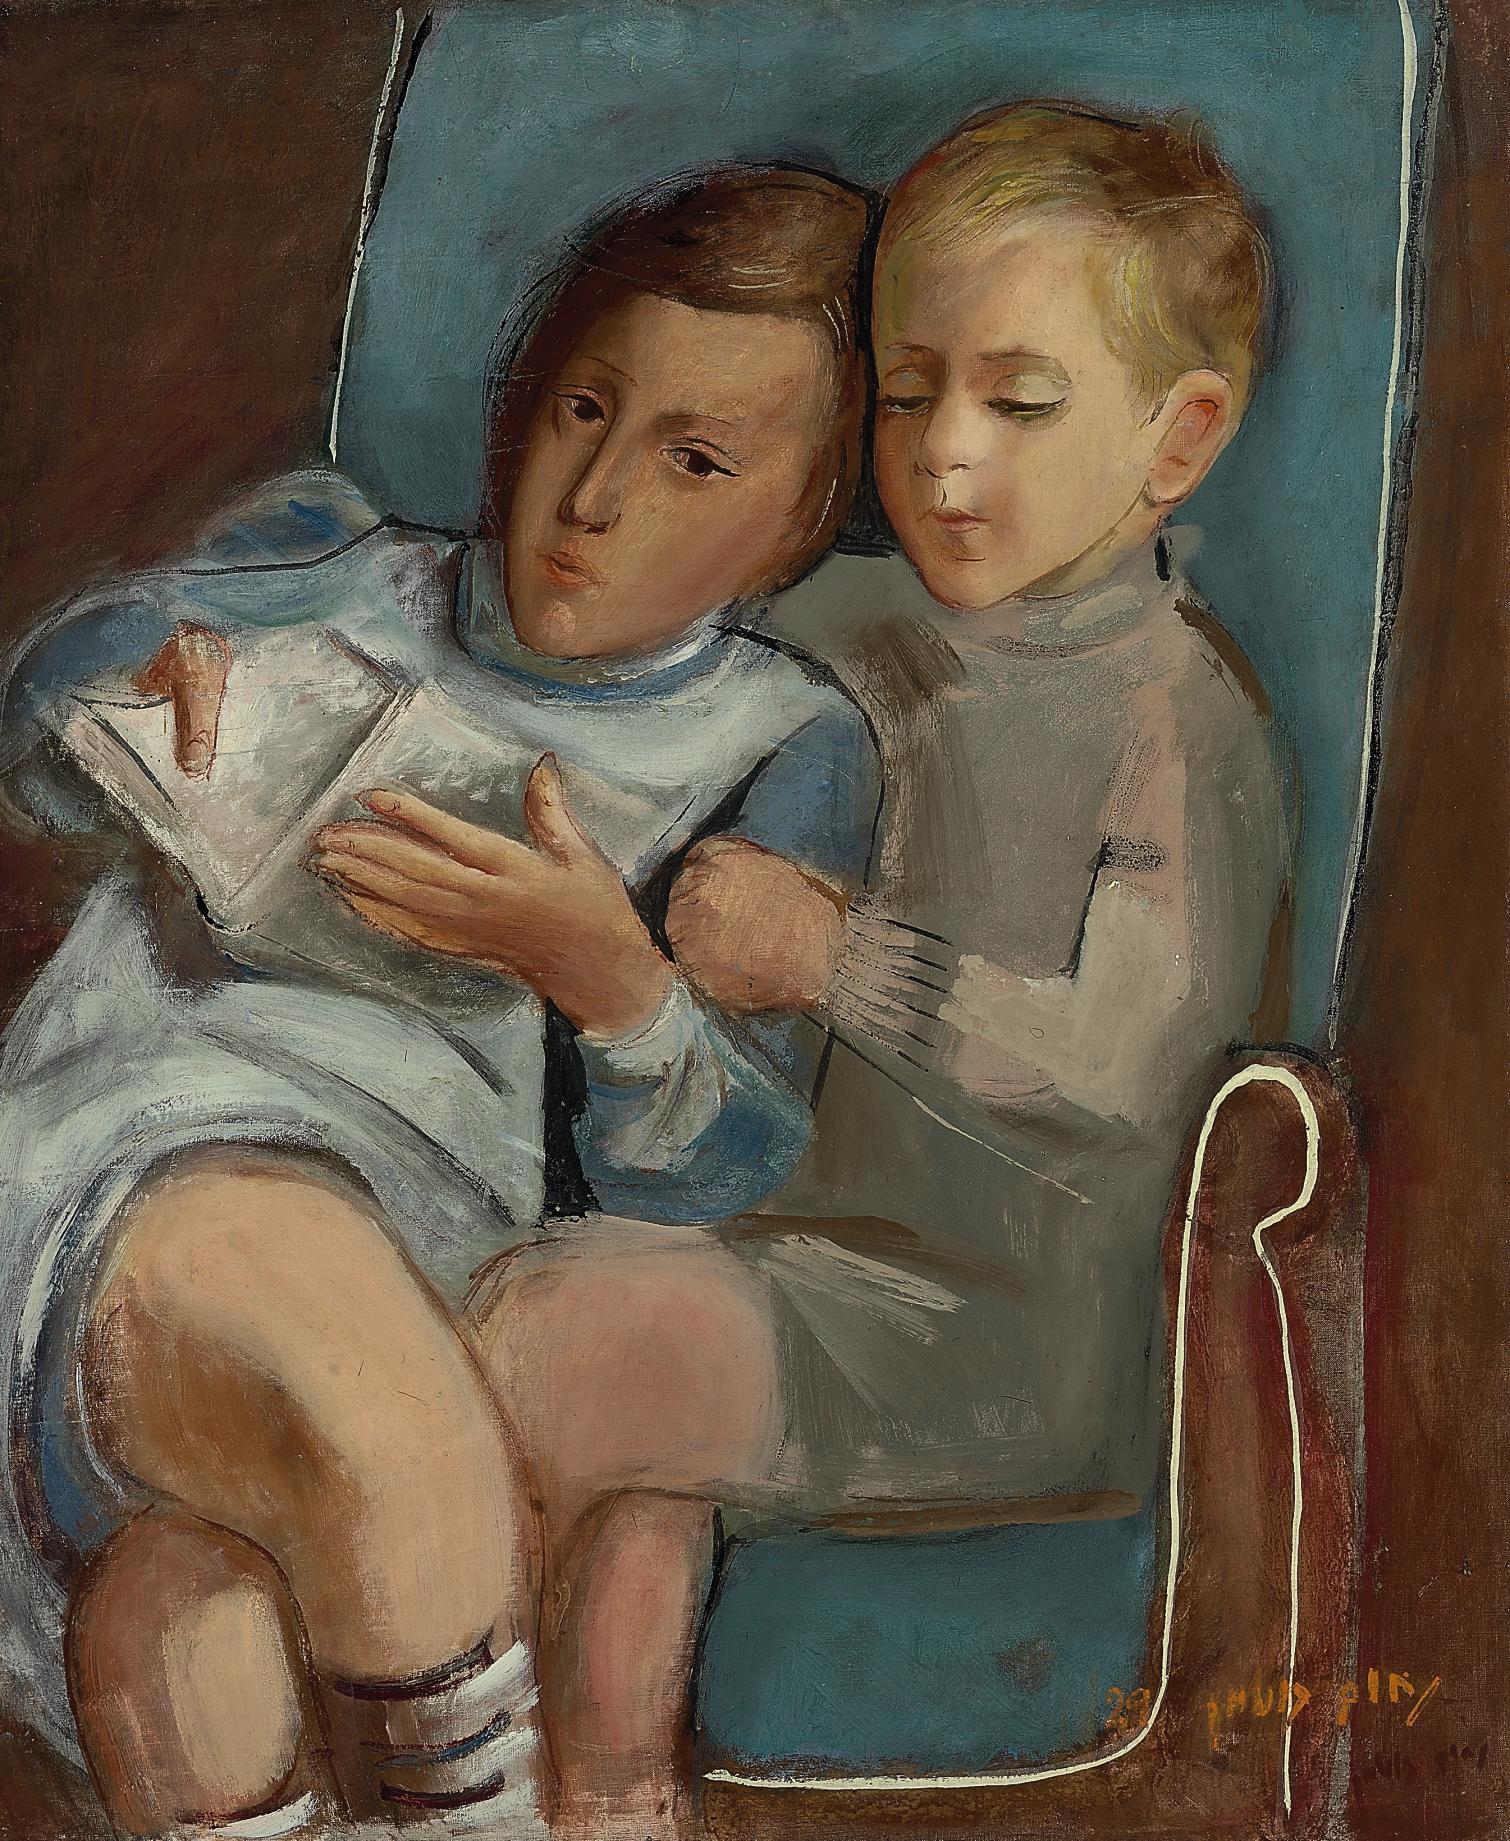 Portrait of Aviva and Yaacov Rechter